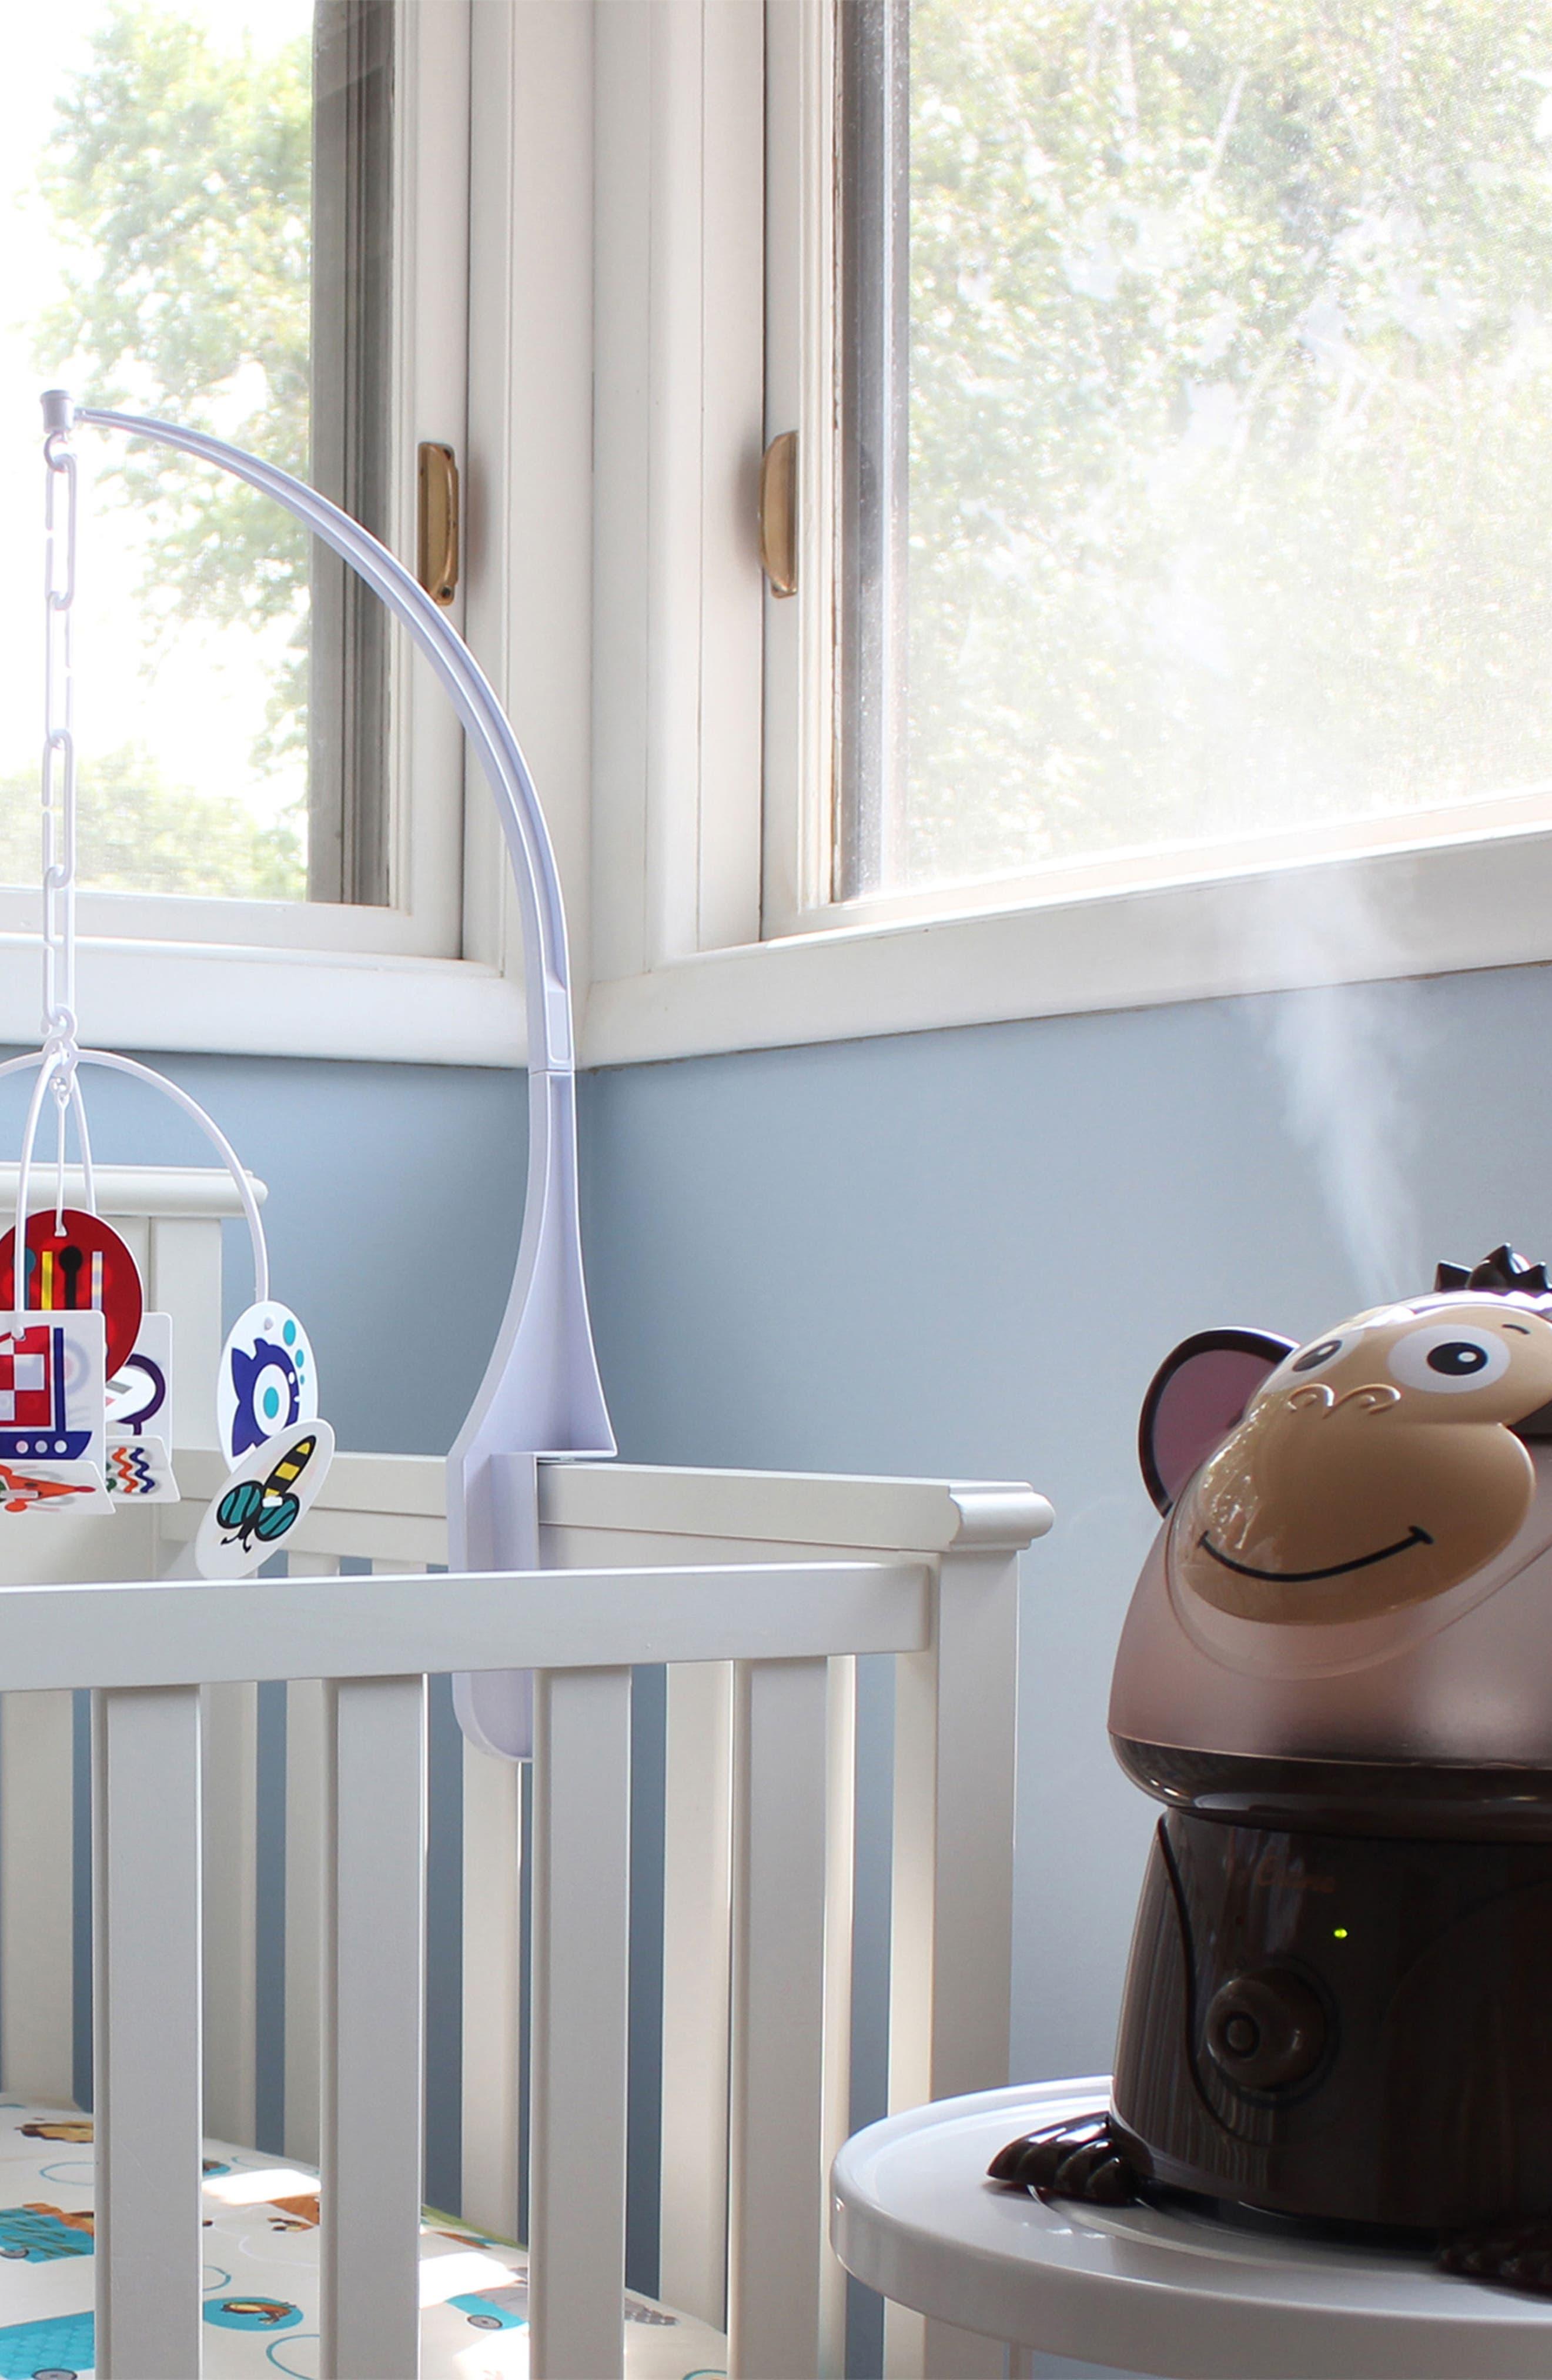 Monkey Ultrasonic Cool-Mist Humidifier,                             Alternate thumbnail 3, color,